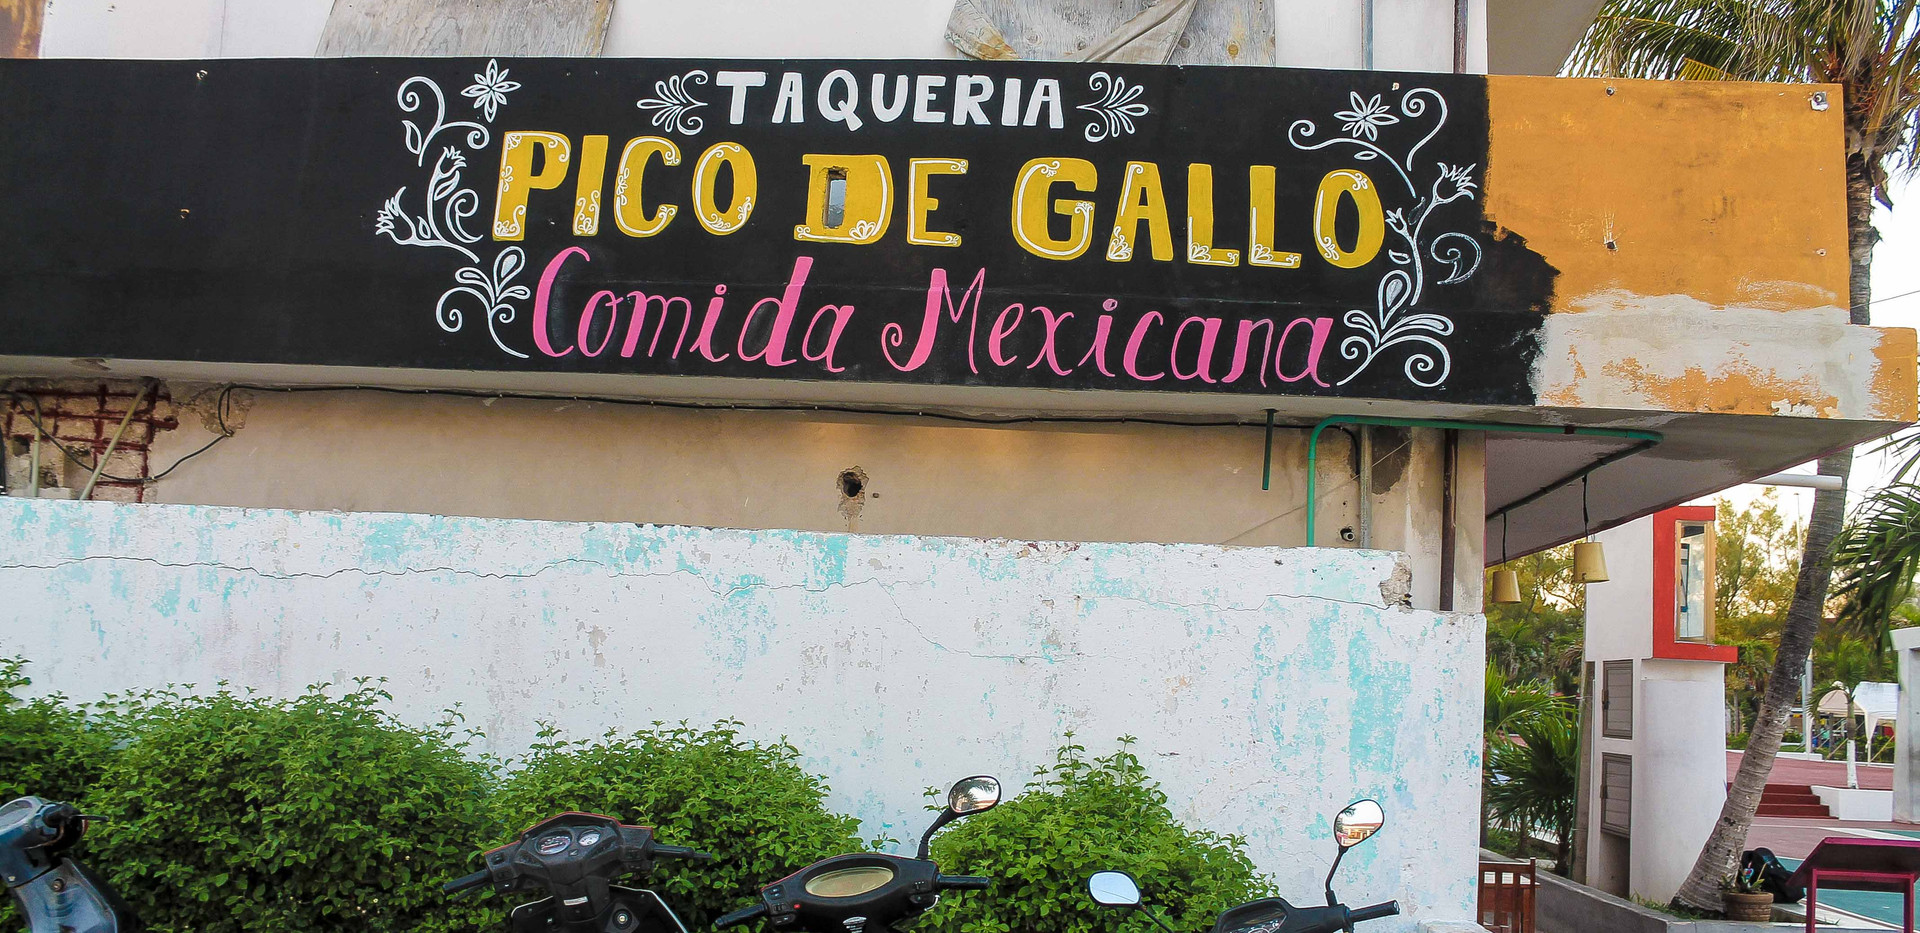 TaqueriaPicoDeGallo-tasteofisla-islamuje